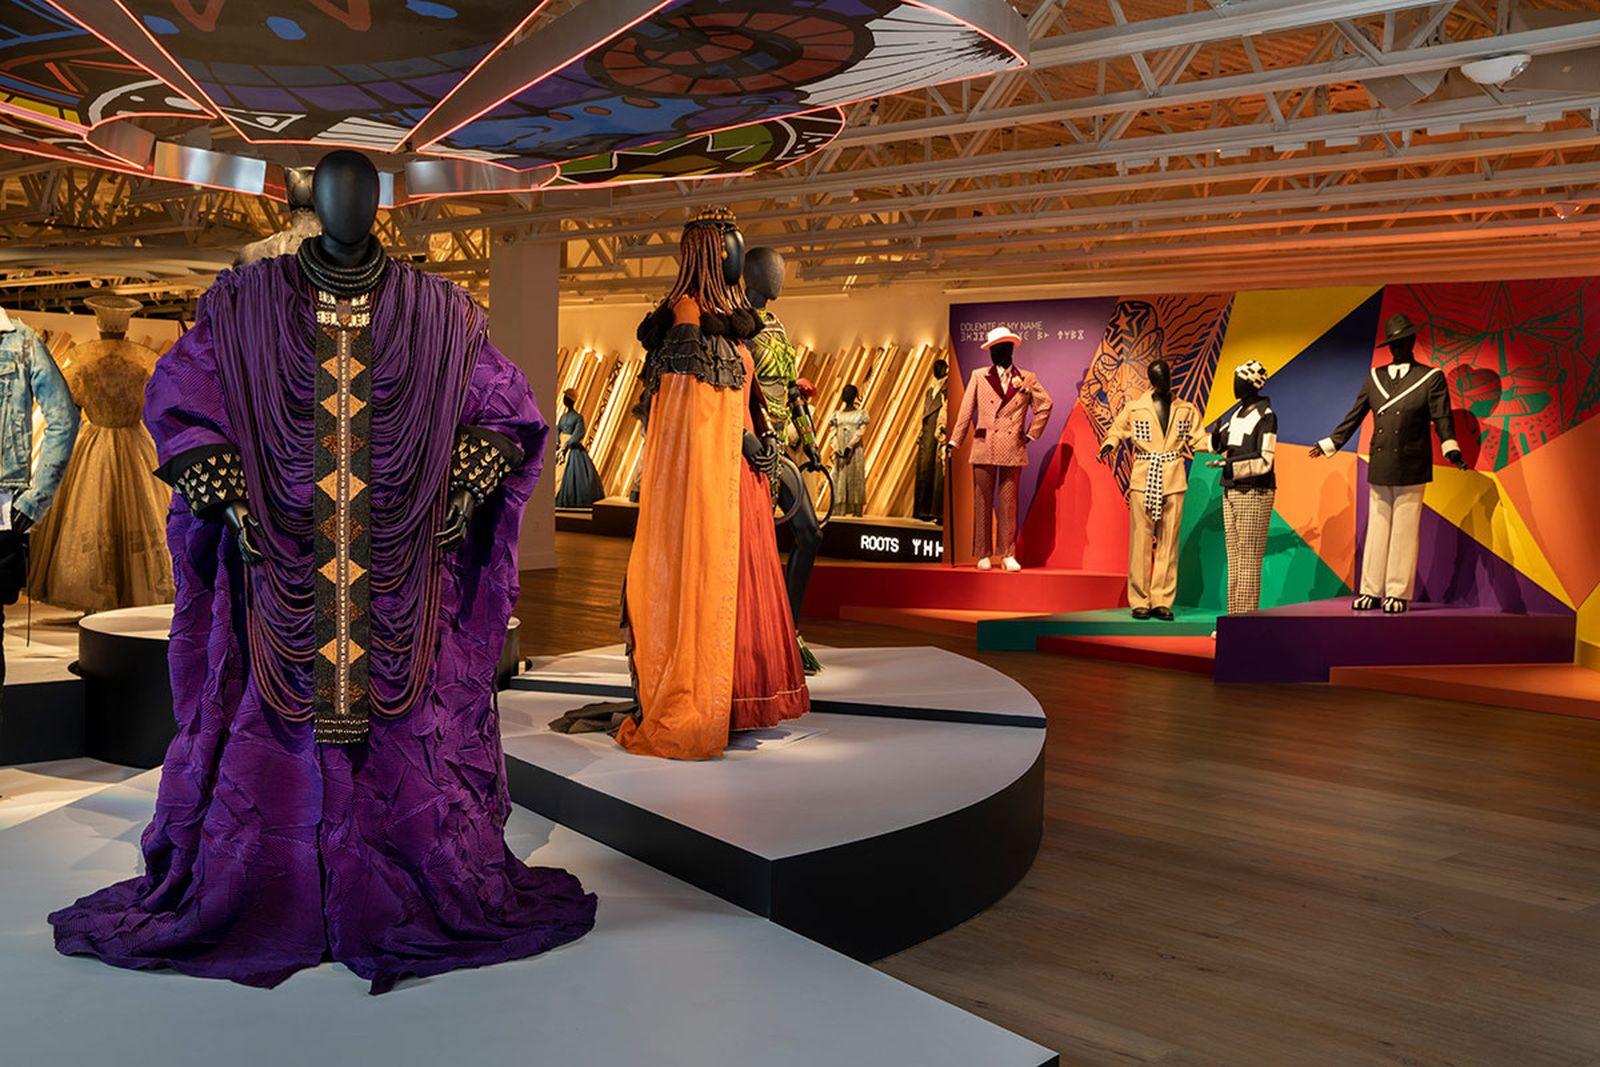 ruth-e-carters-afrofuturism-costume-design-02